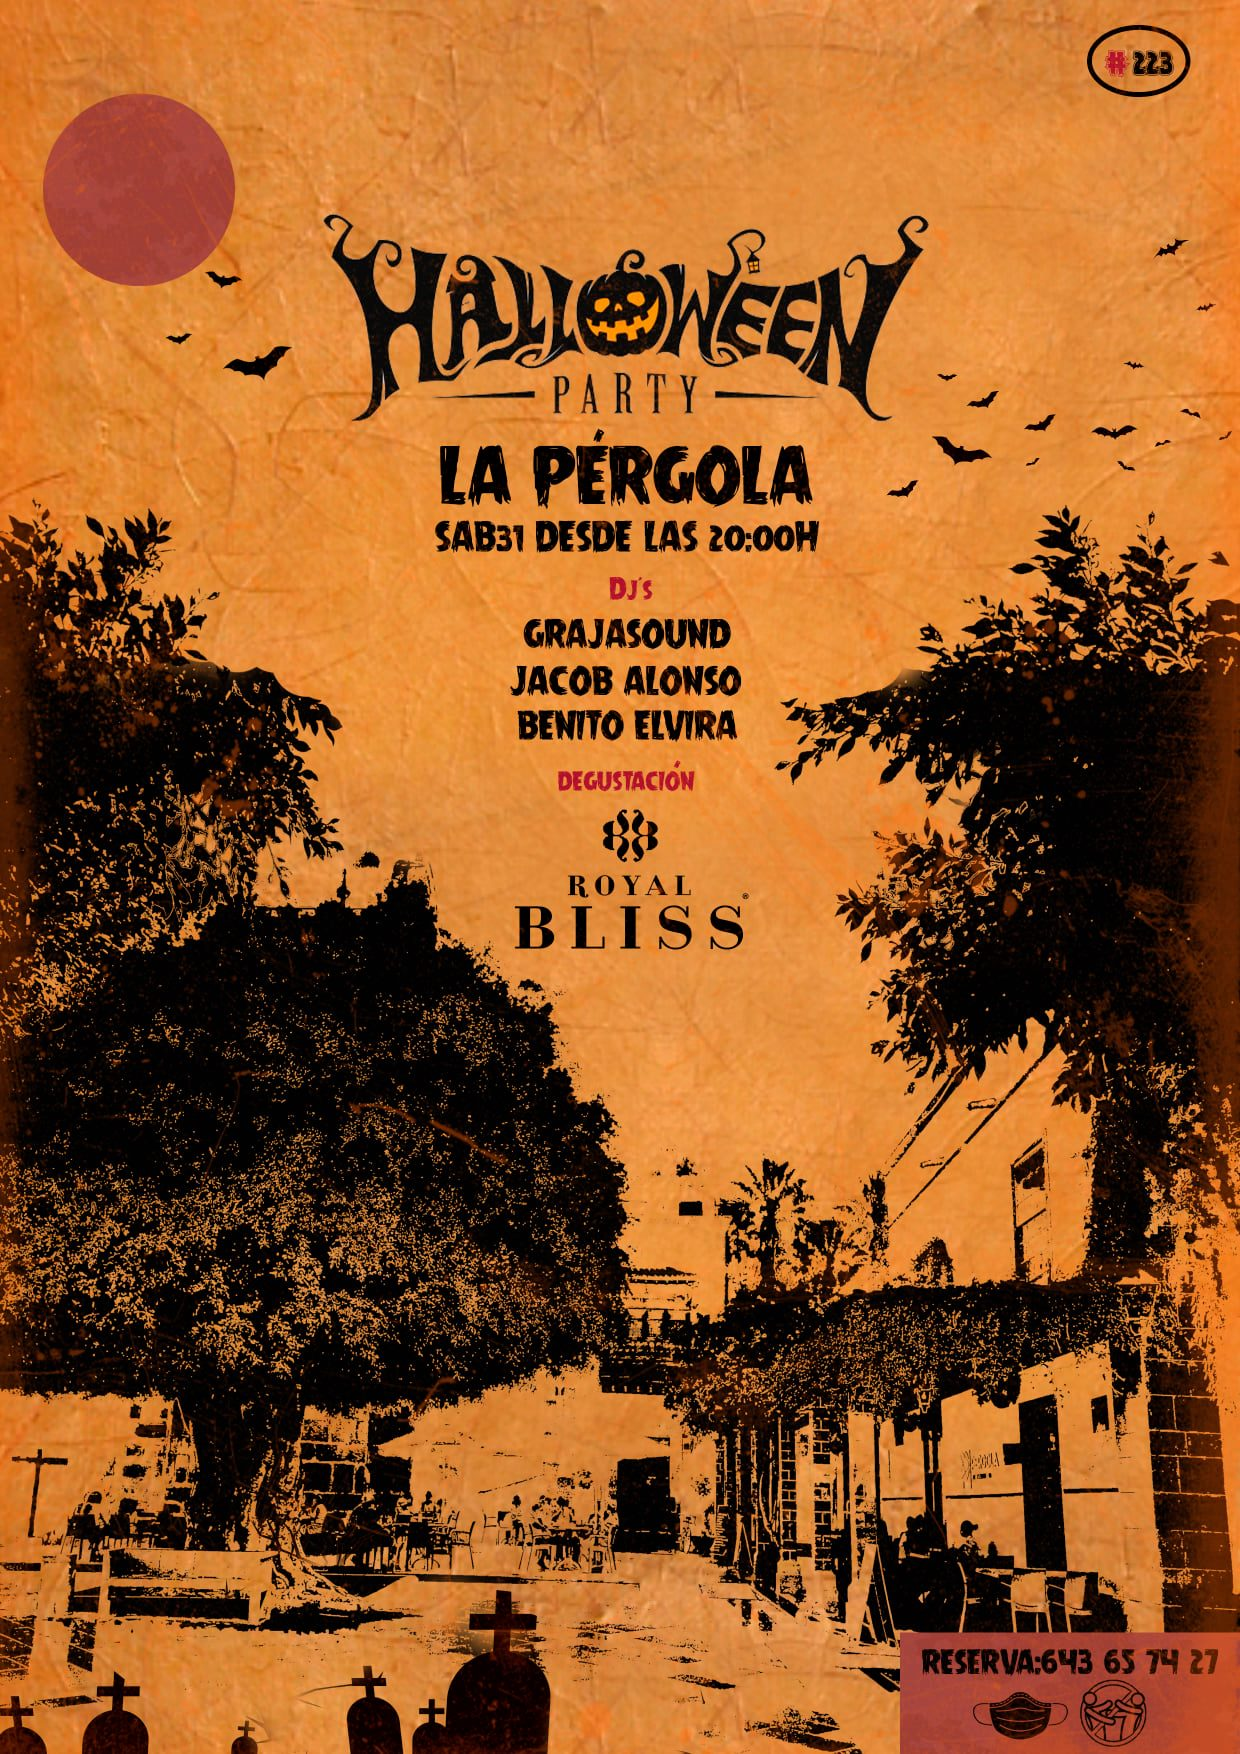 31-10-2020-grajasound-halloween-la-pergola